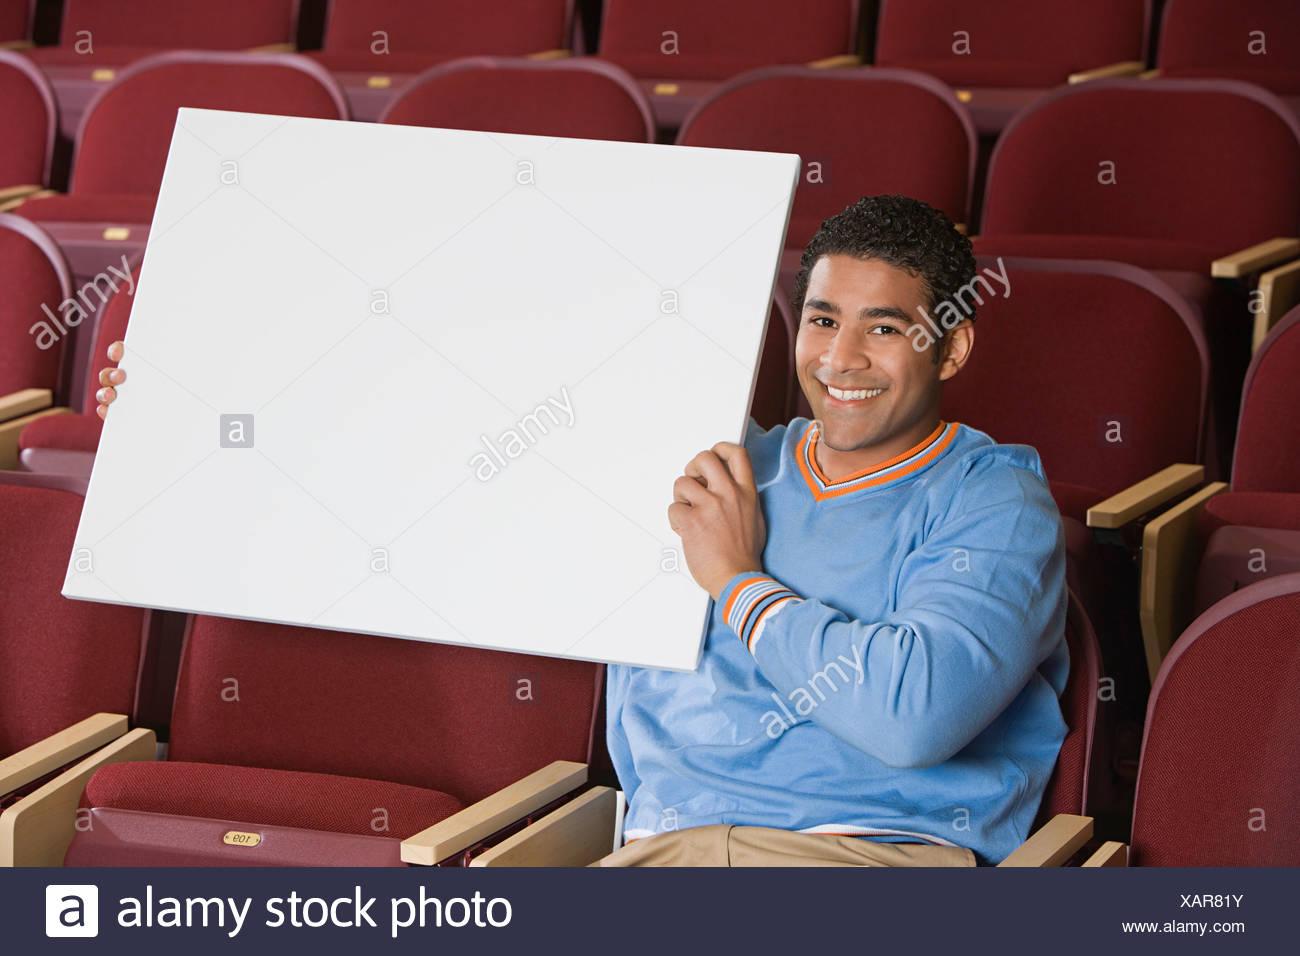 Man sitting in auditorium, holding empty placard - Stock Image